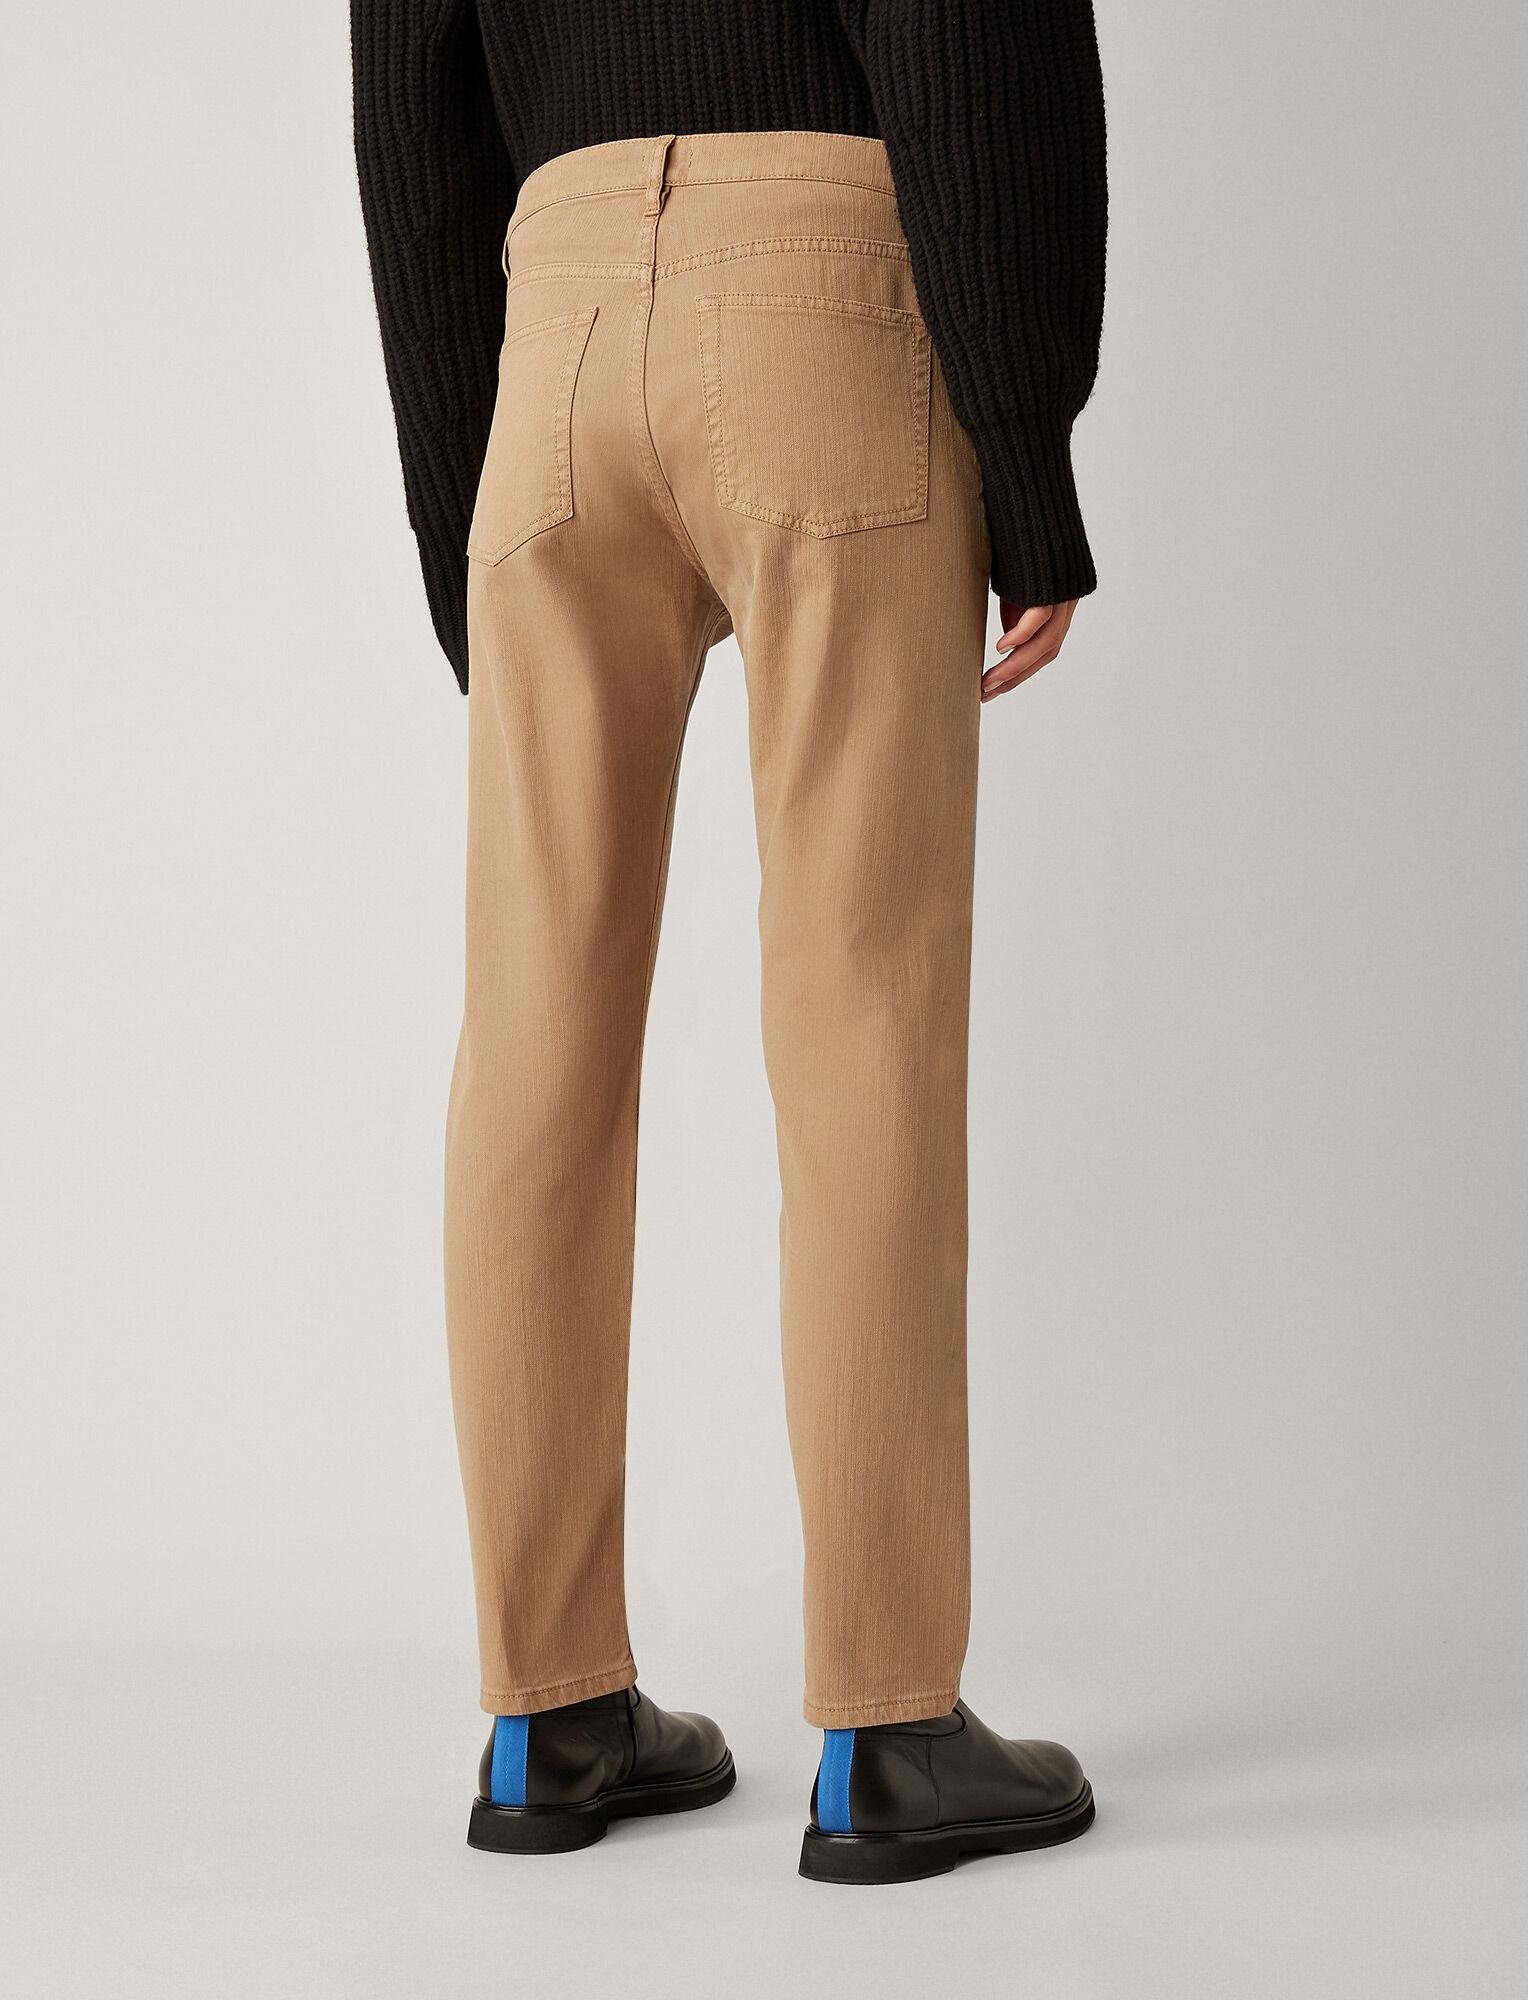 Joseph, Kemp Overdye Denim Trousers, in CAMEL